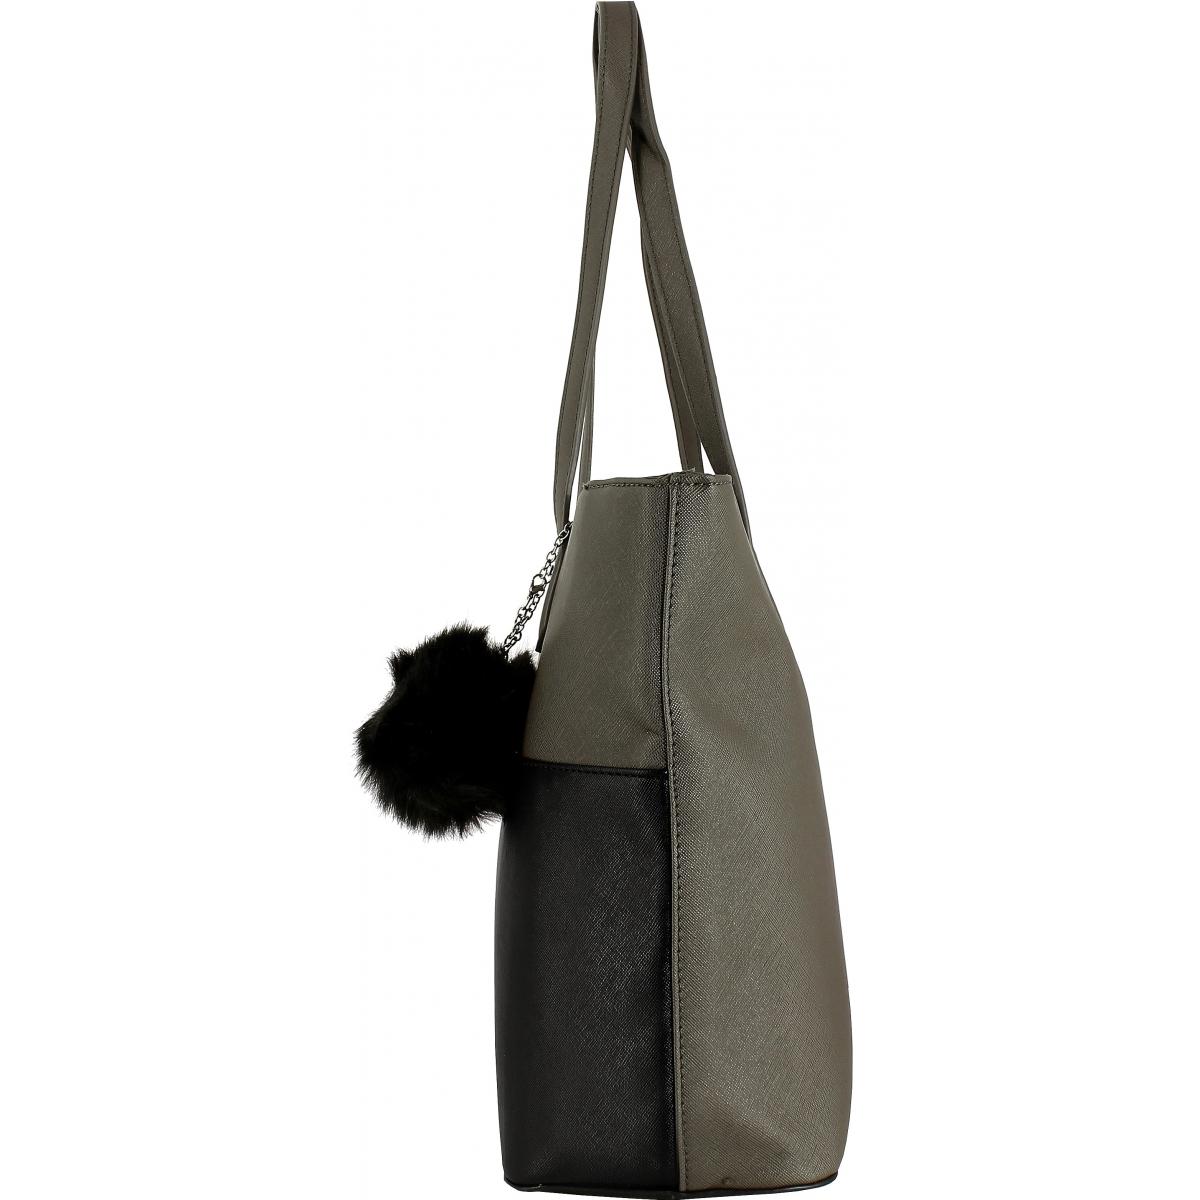 Sac shopping pas cher tote bag sac shopping coton pas cher vierge 140 g m sac shopping pas - Ice bag pas cher ...